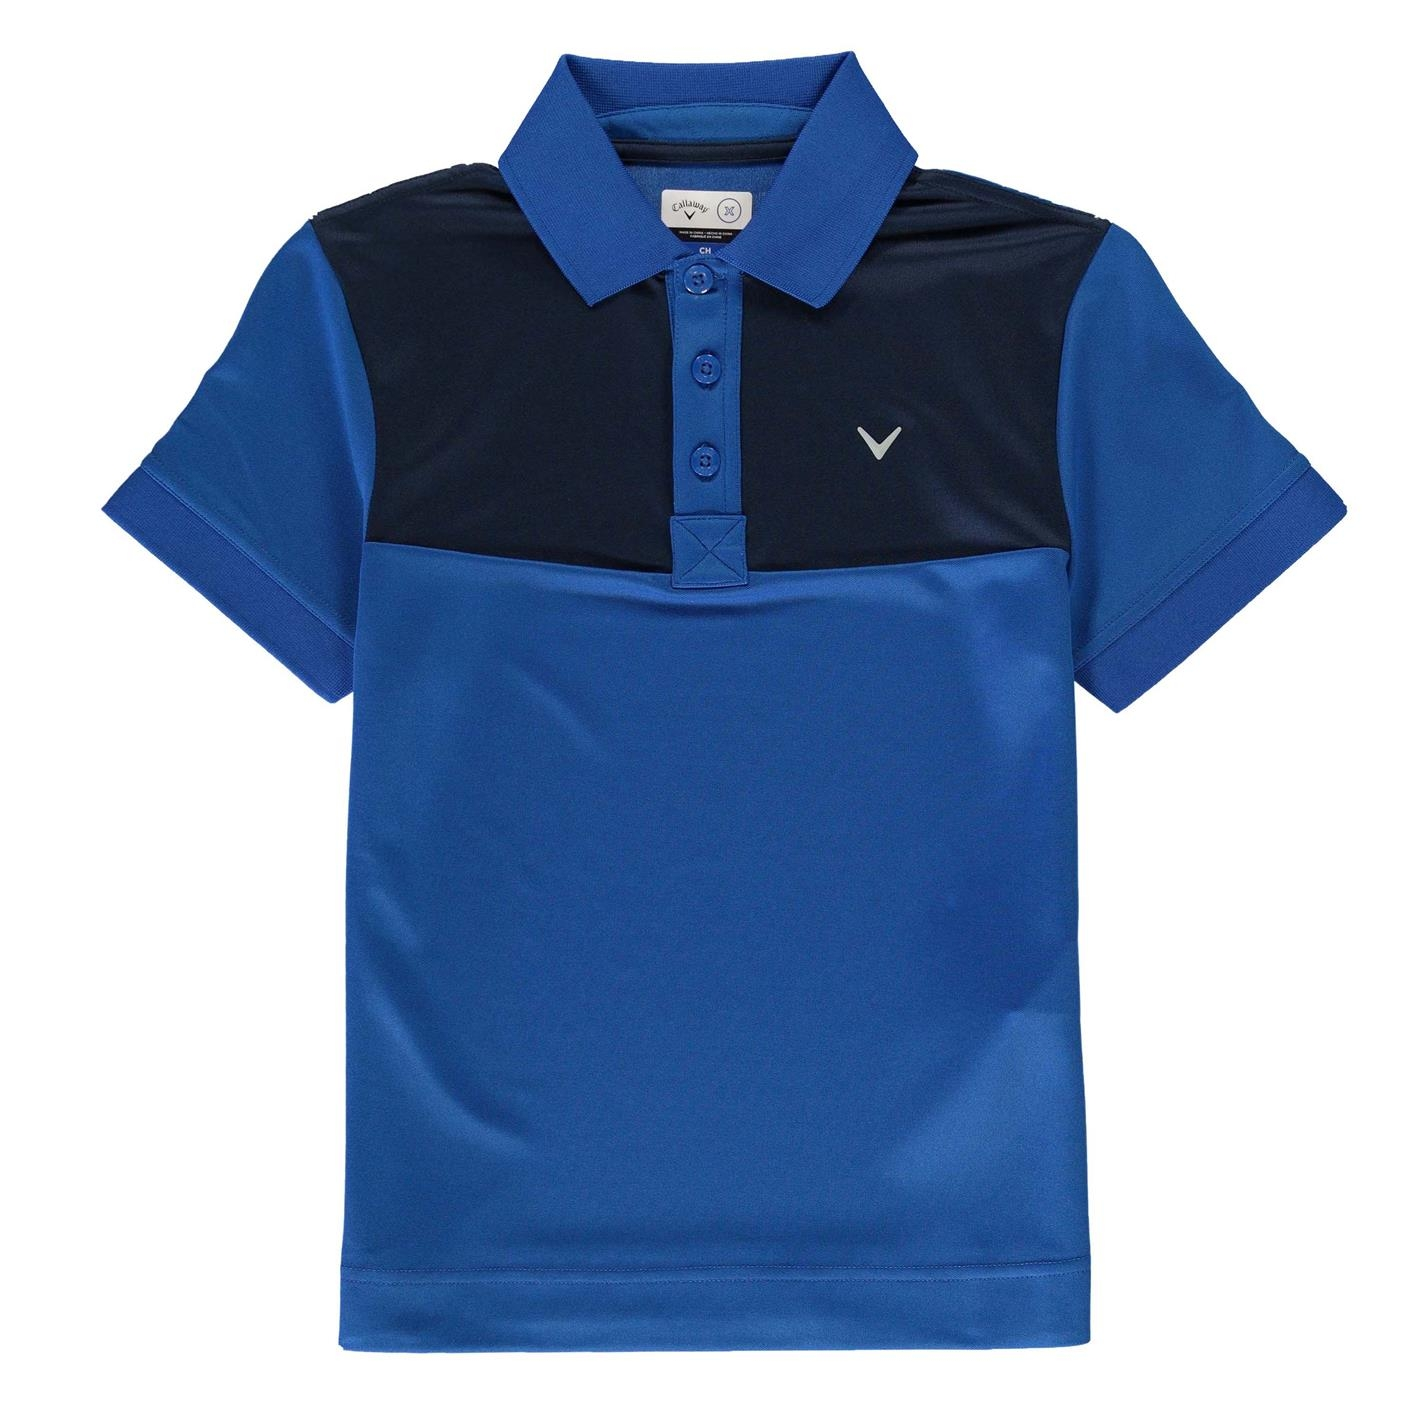 Tricouri Polo Callaway Youth Colour Block Juniors albastru